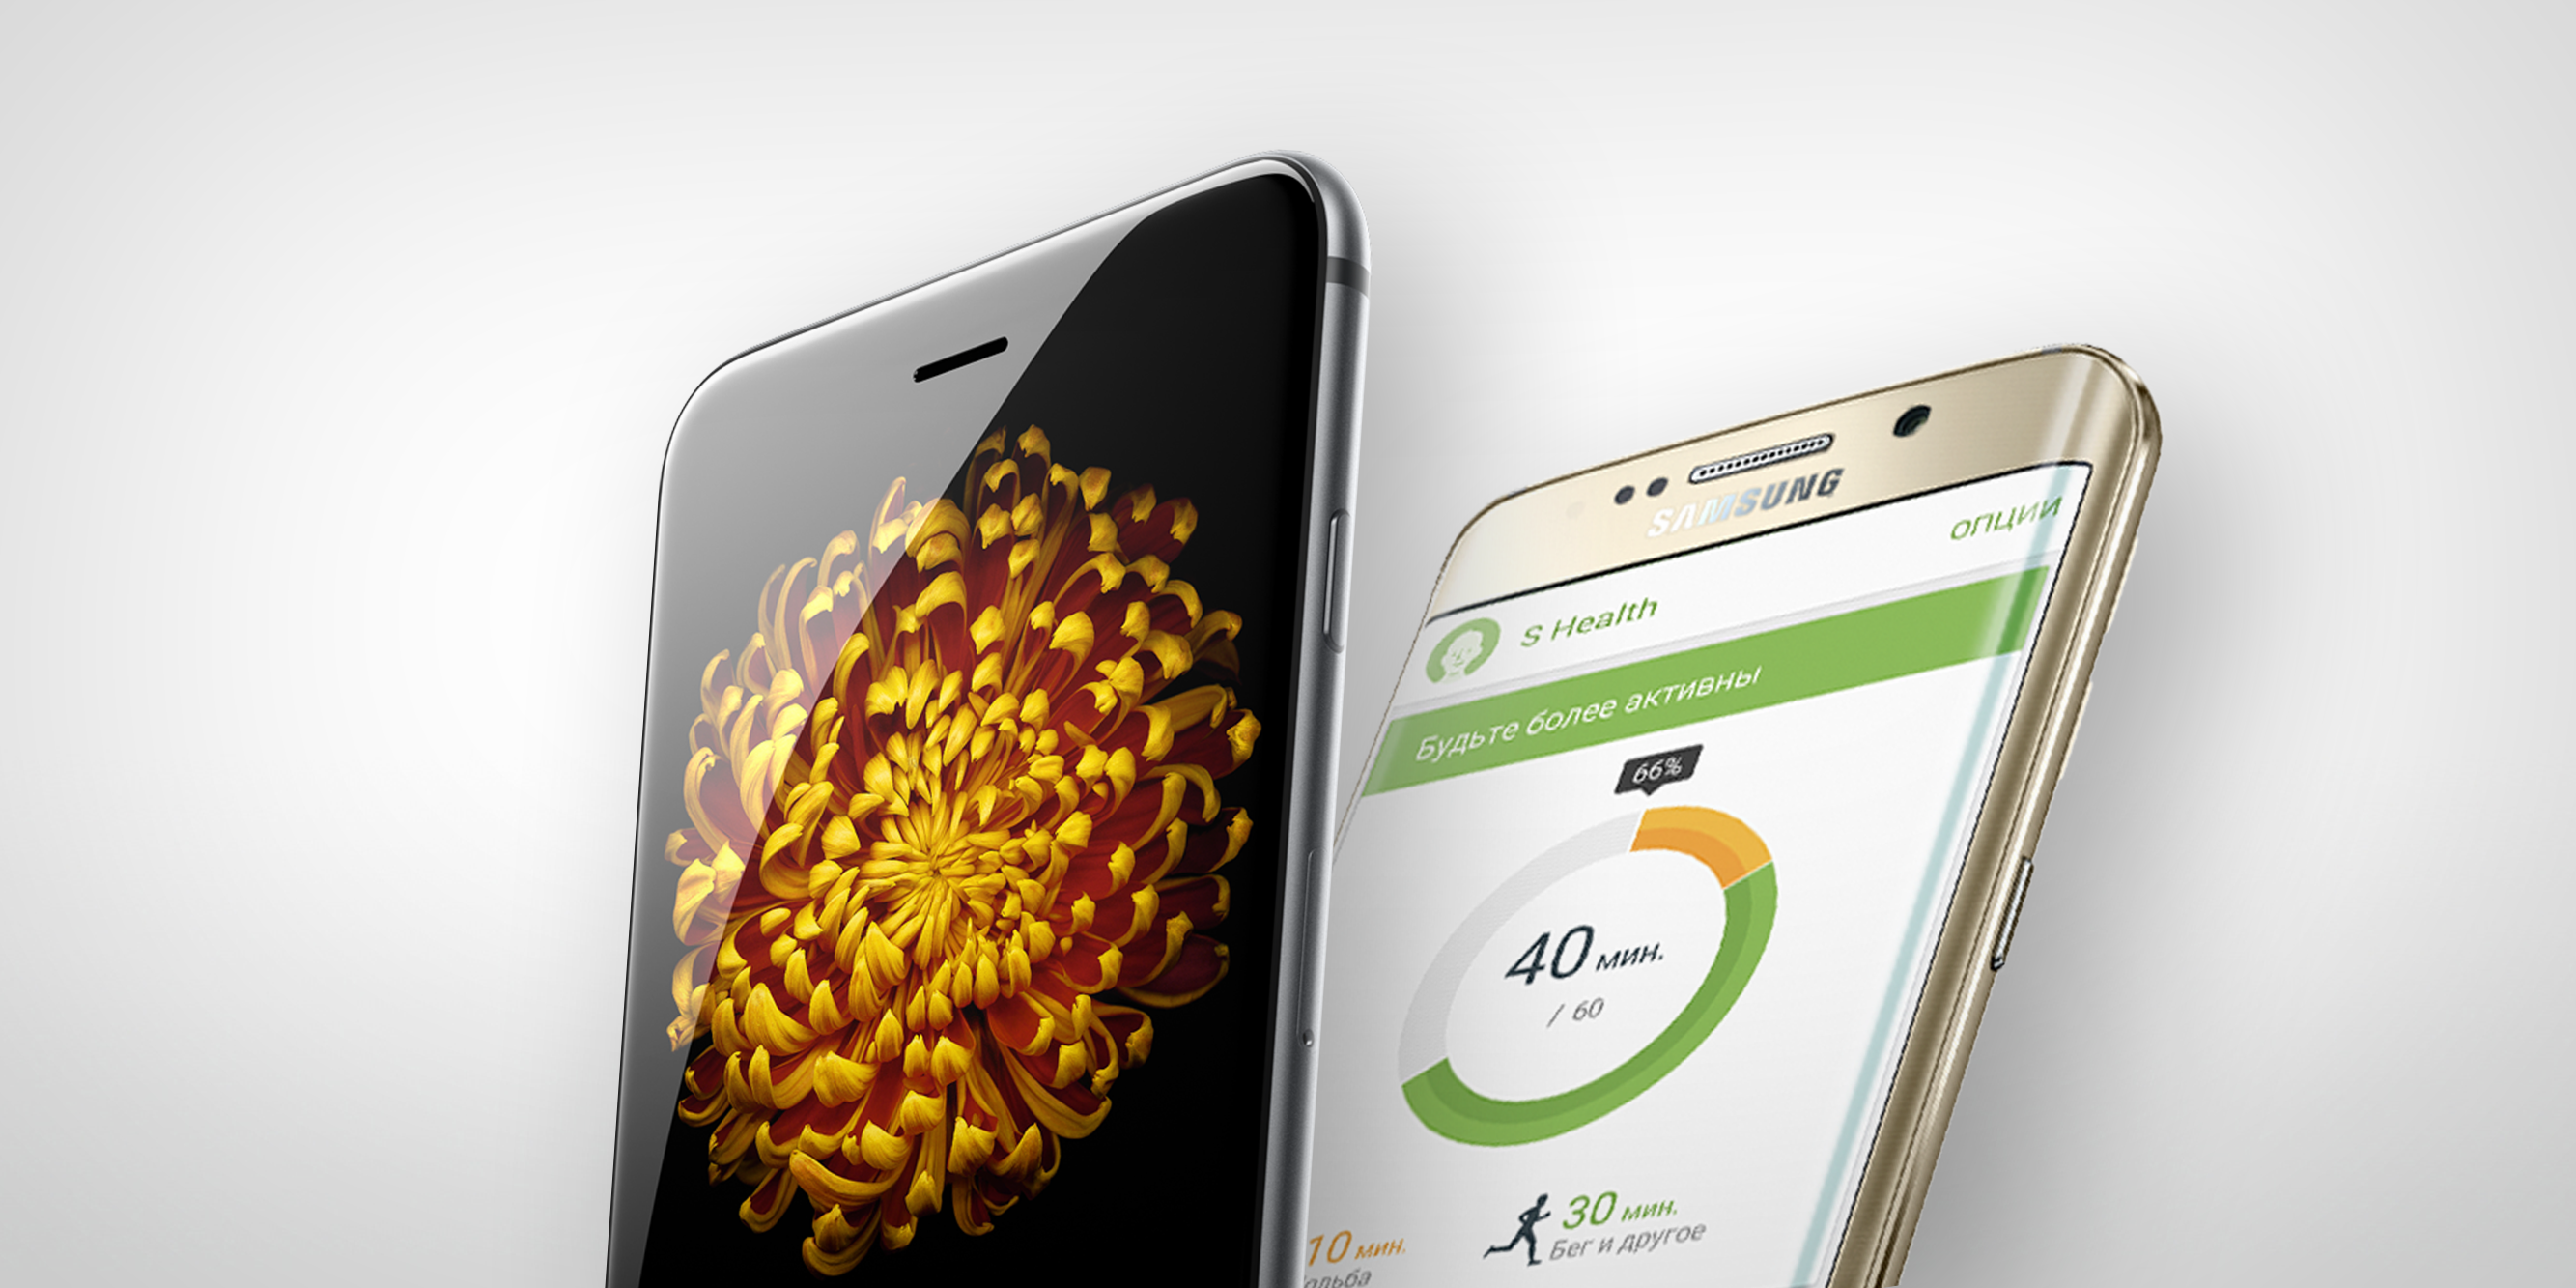 Samsung Galaxy S6 Plus против iPhone 6 Plus. Что лучше?